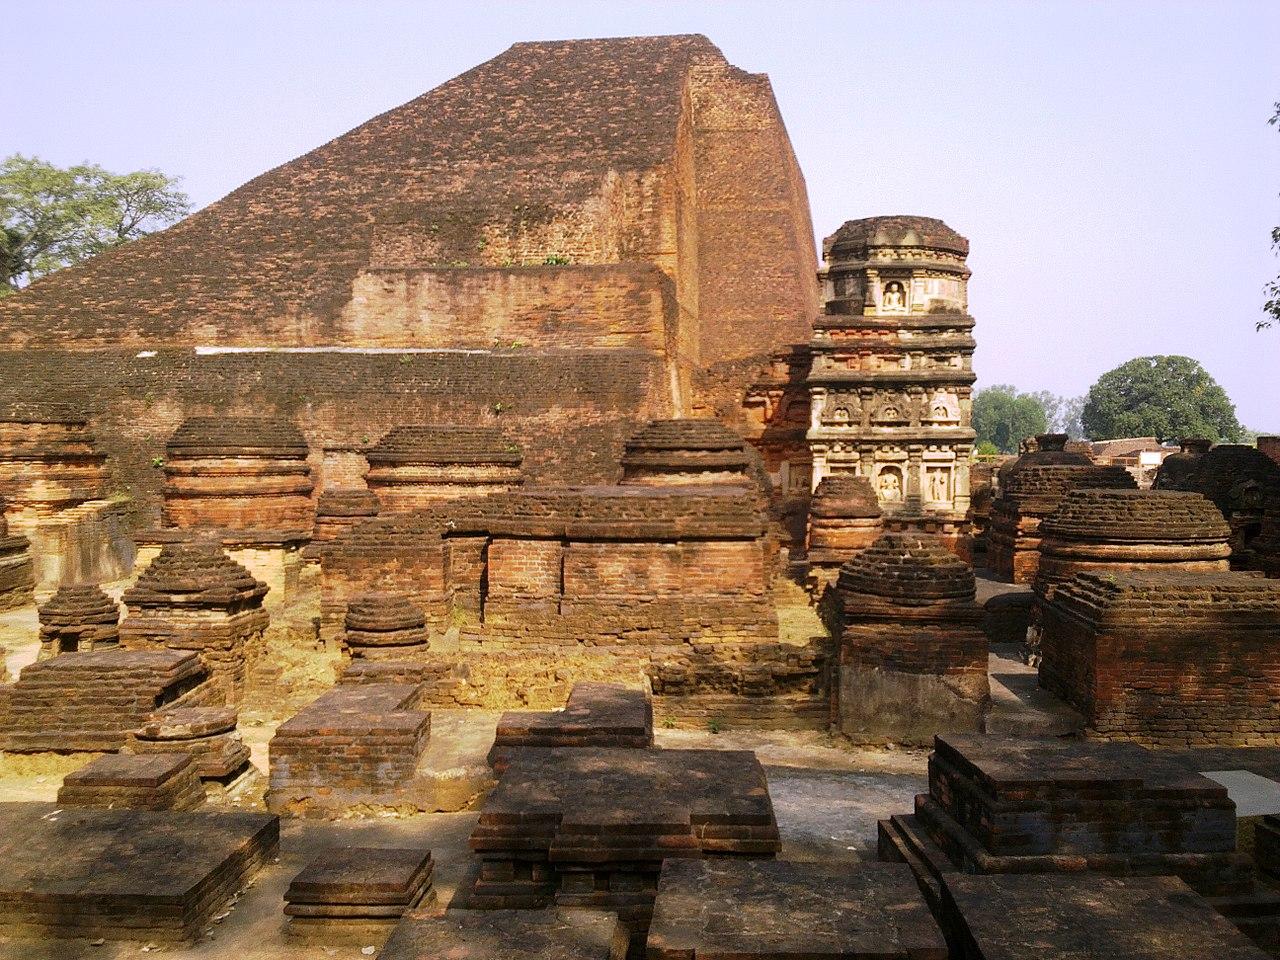 Top Attraction Place In Nalanda-Nalanda Stupa